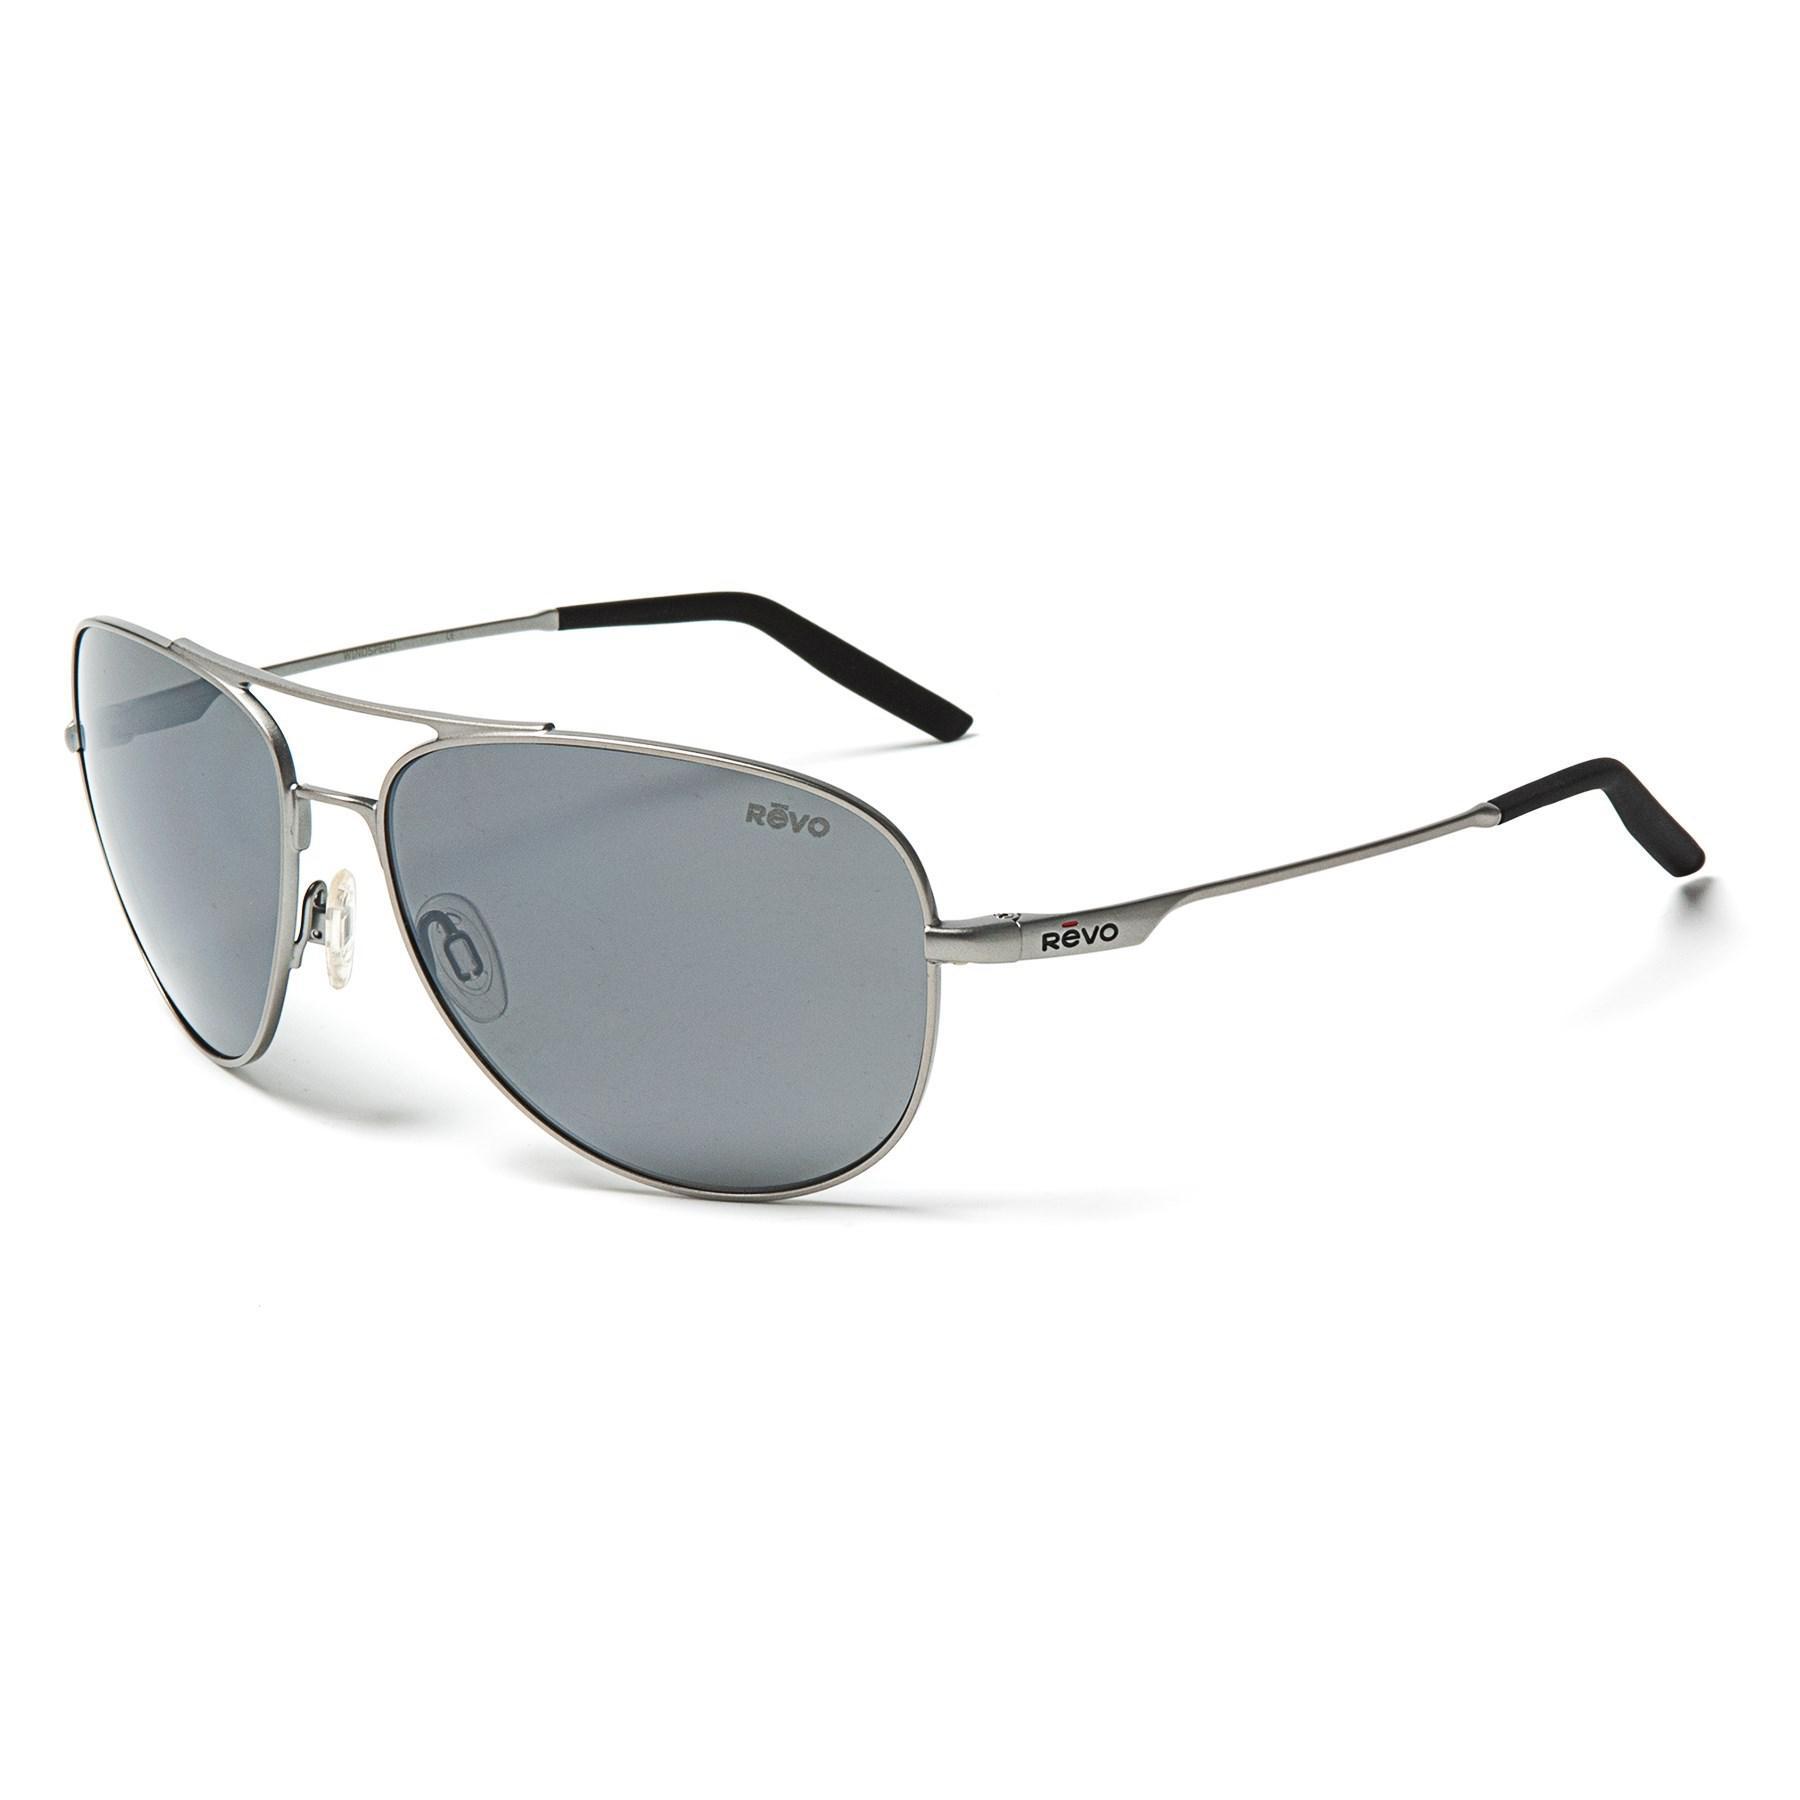 a6c8a4c089 Revo - Gray Windspeed Sunglasses for Men - Lyst. View fullscreen